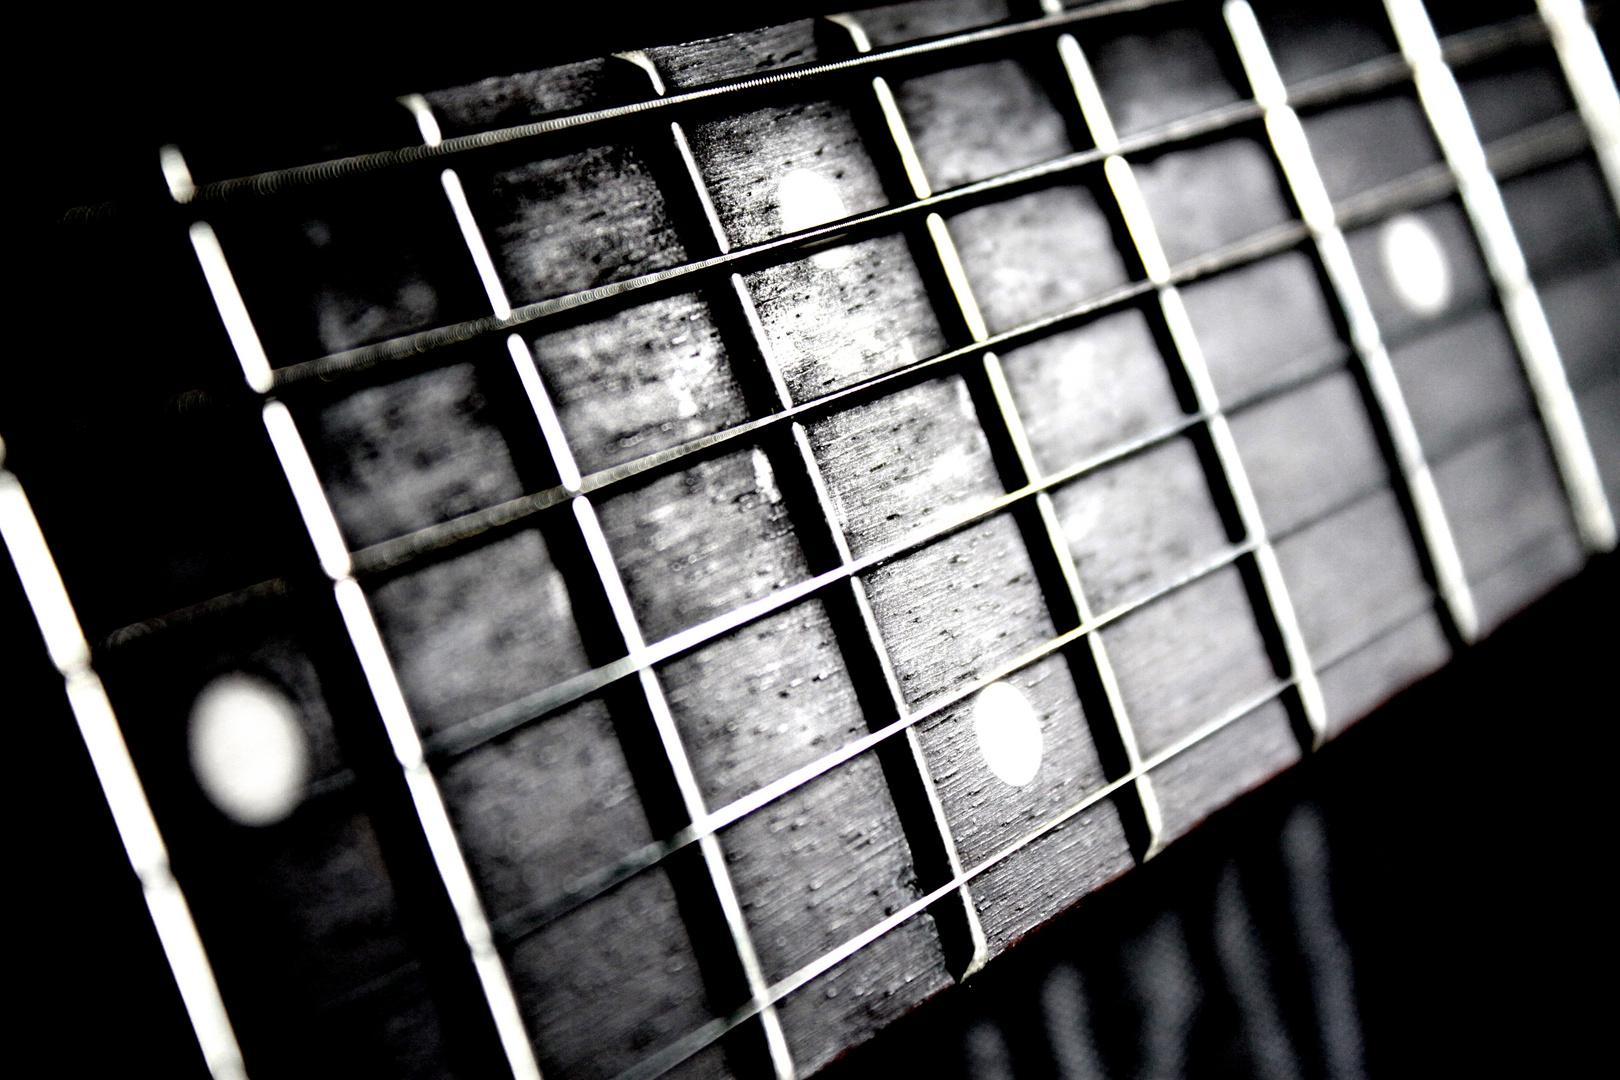 I love the sound of crashing guitars